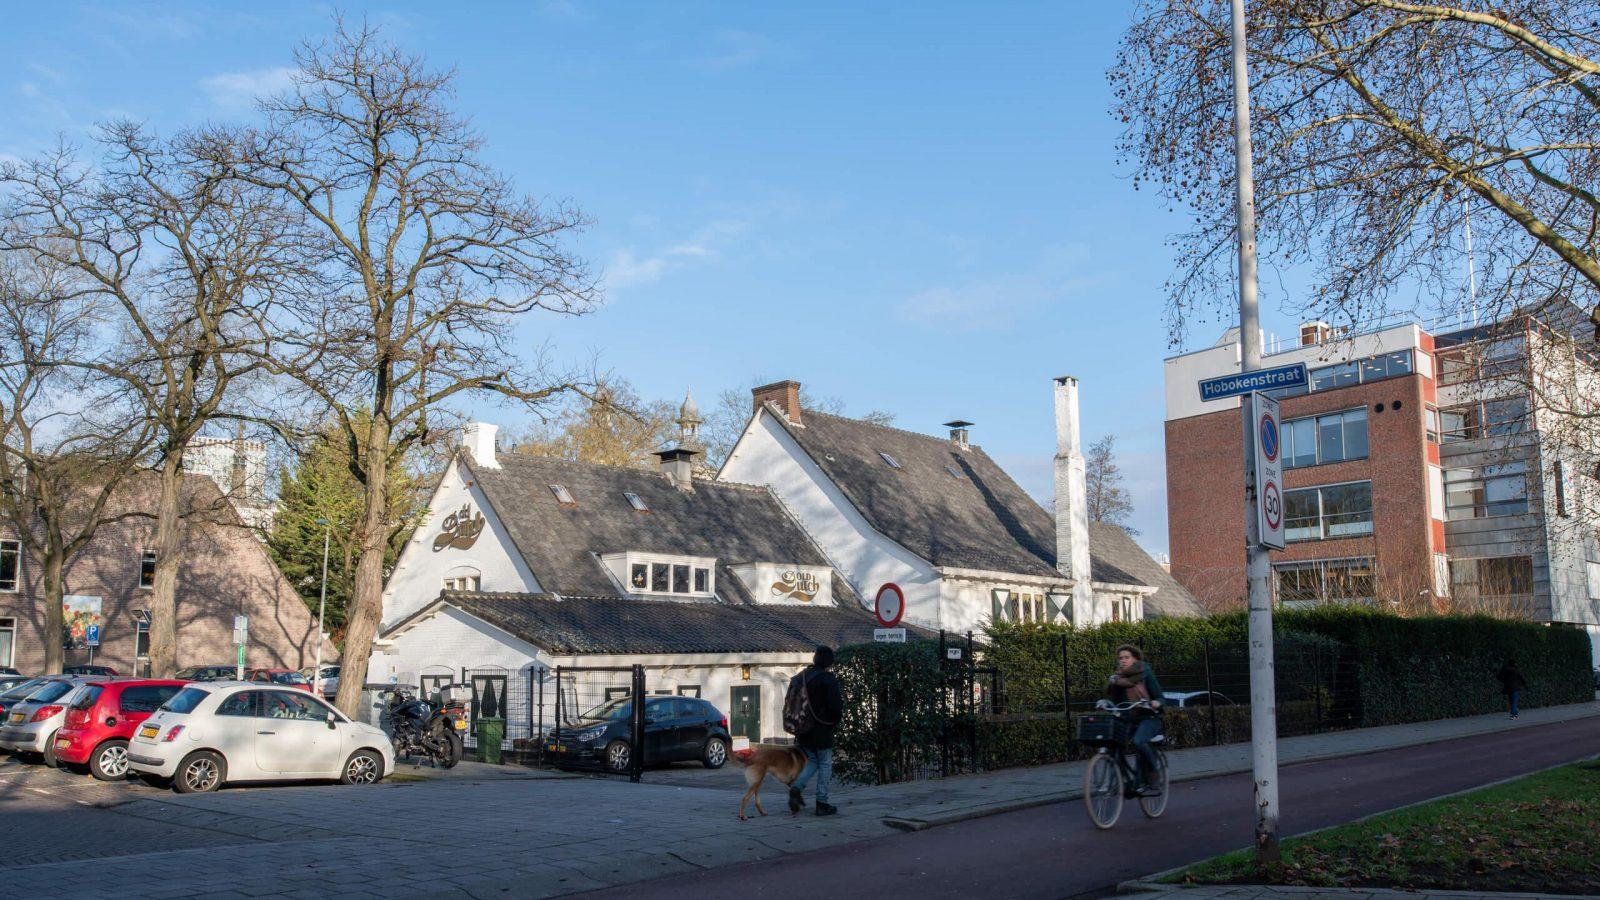 2021 Marlies Lageweg DSC 5246 Old Dutch